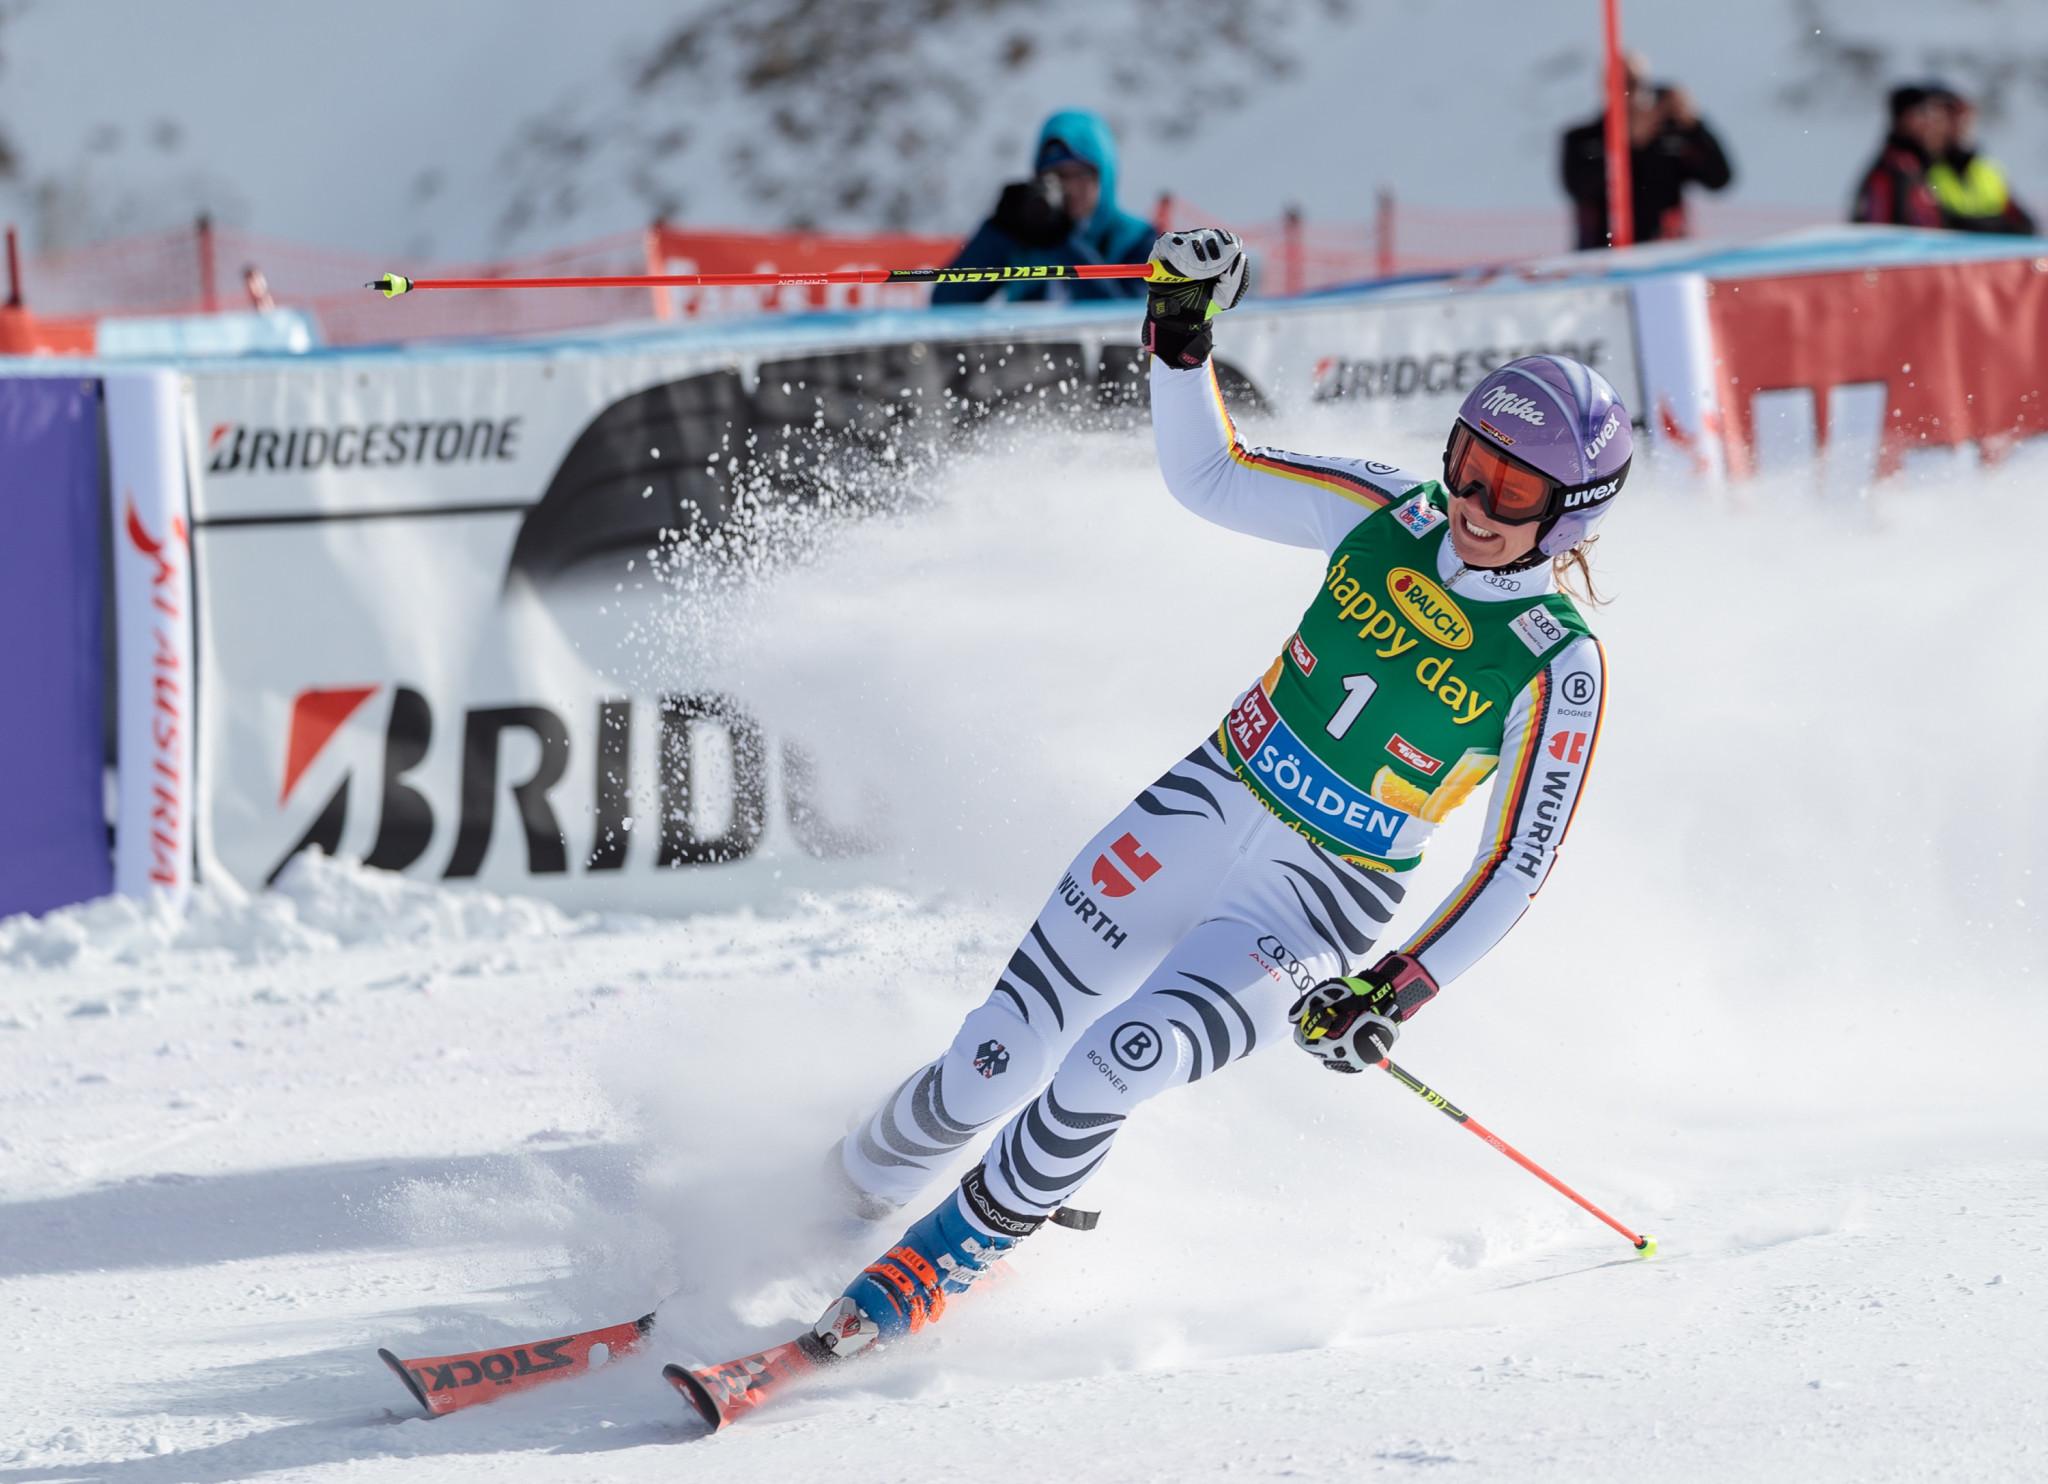 Germany's Rebensburg wins season-opening giant slalom at FIS Alpine Skiing World Cup in Soelden